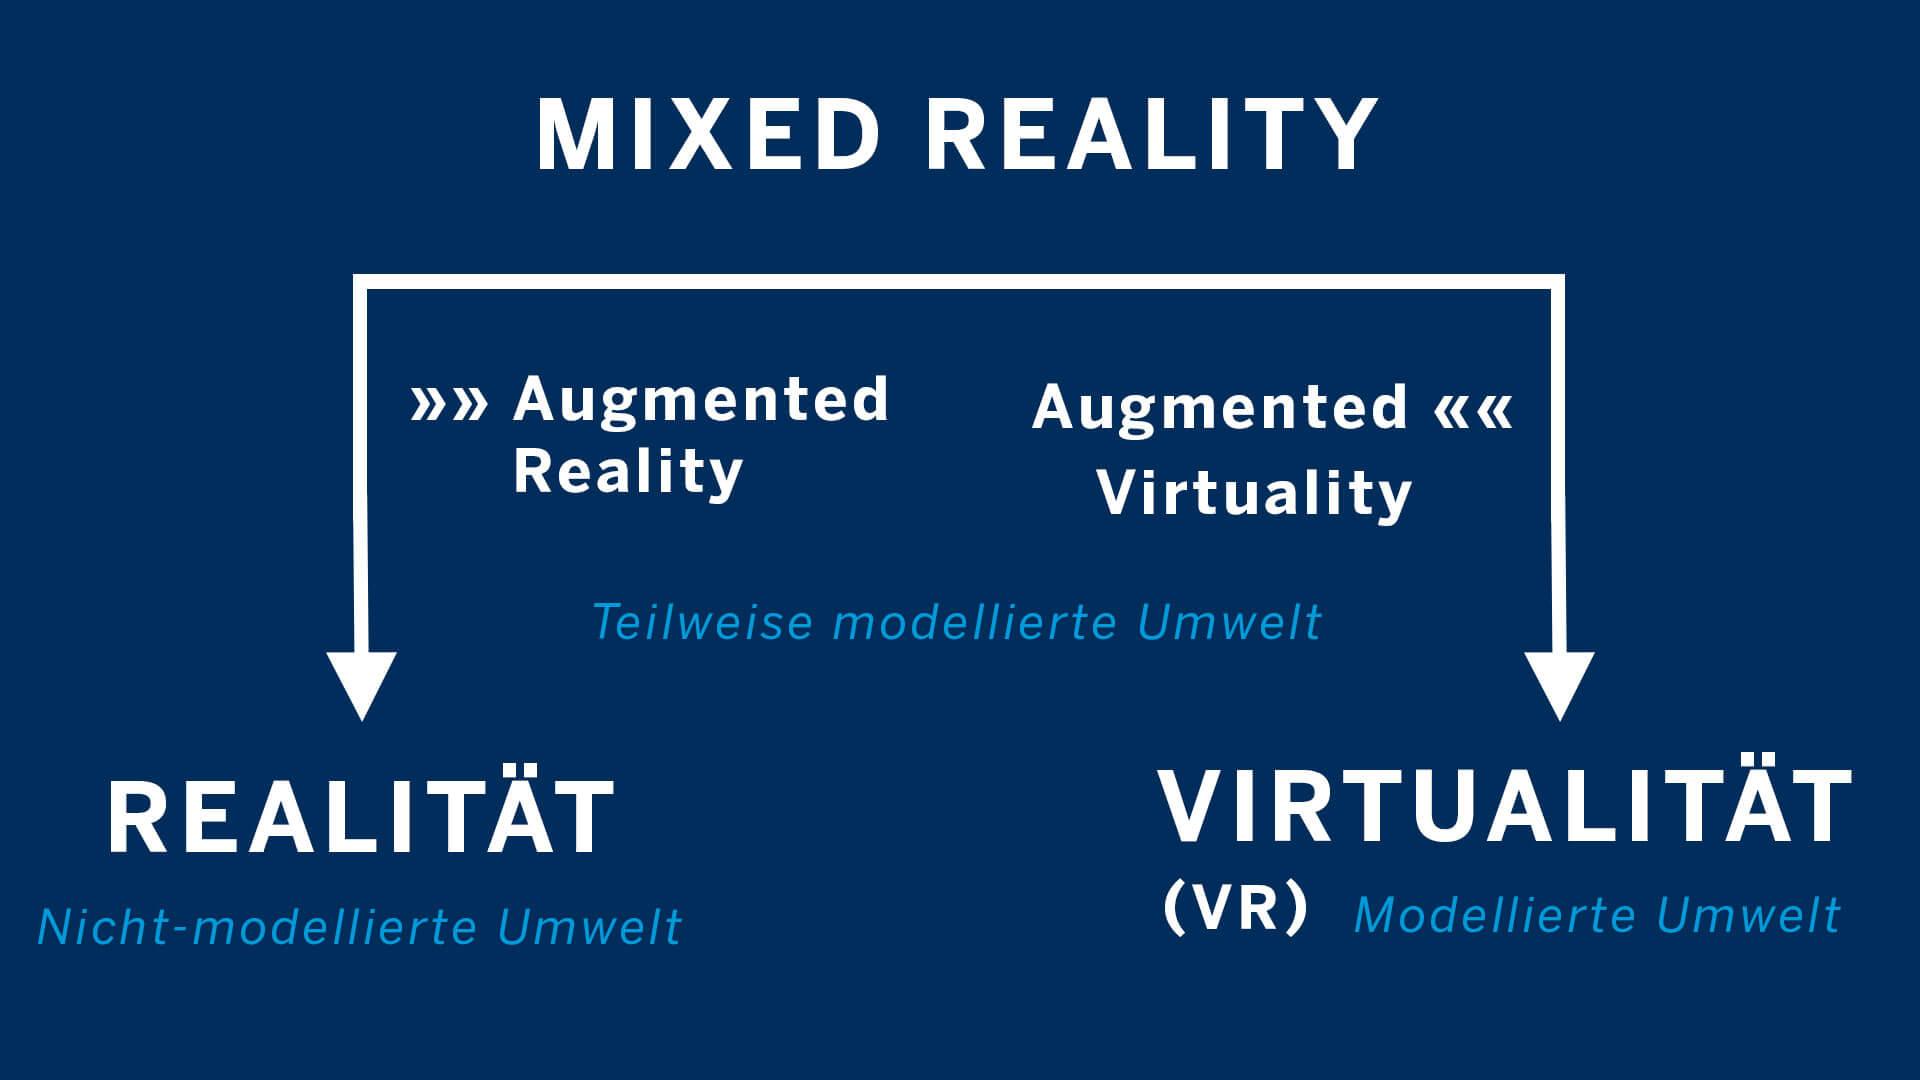 Realitäts-Virtualitäts-Kontinuum nach Paul Milgram